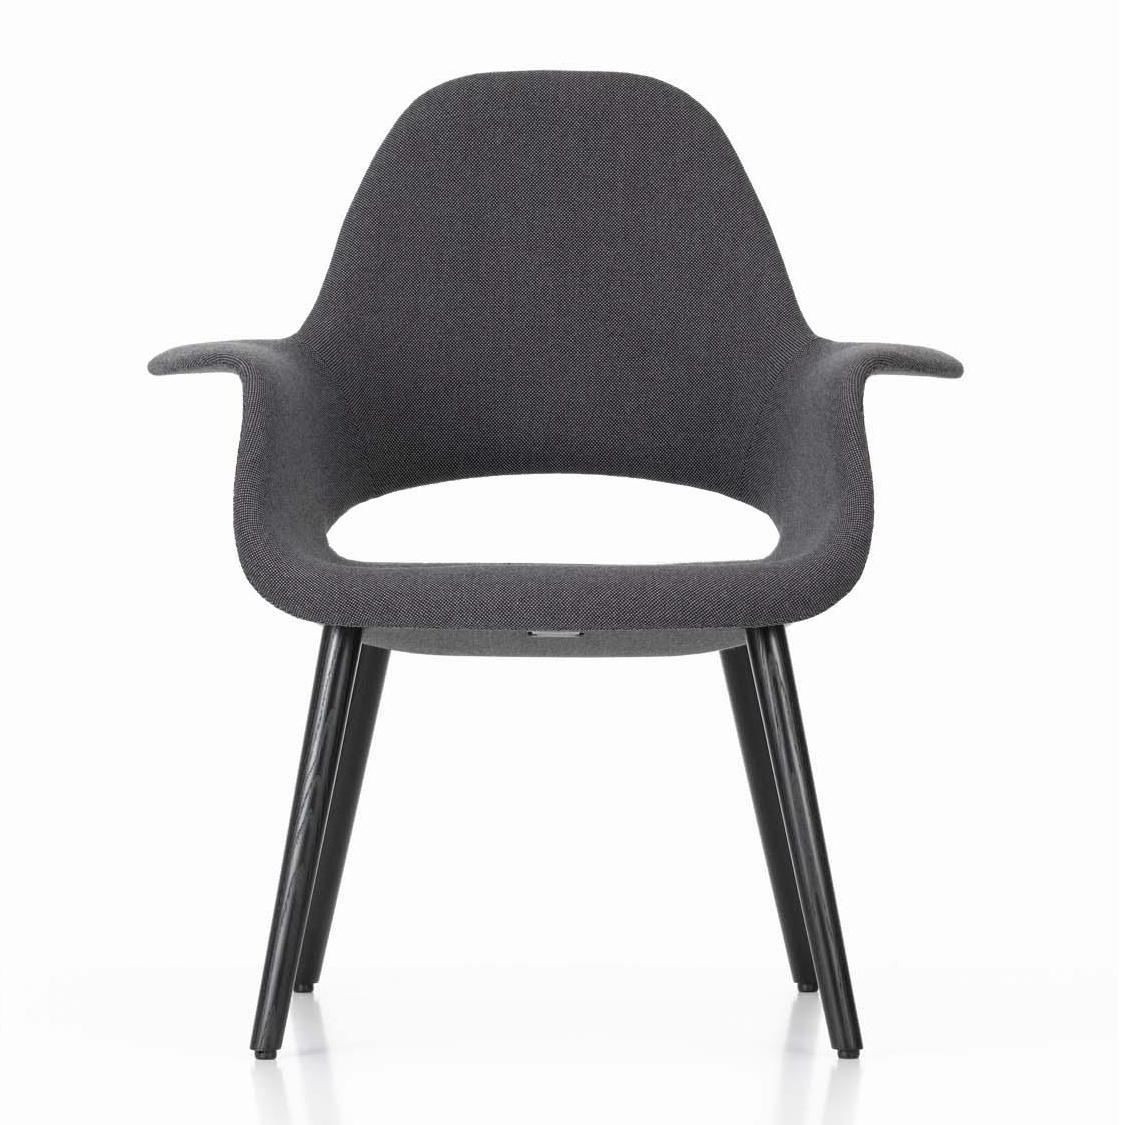 Organic chair vitra charles eames for Stuhl design wettbewerb